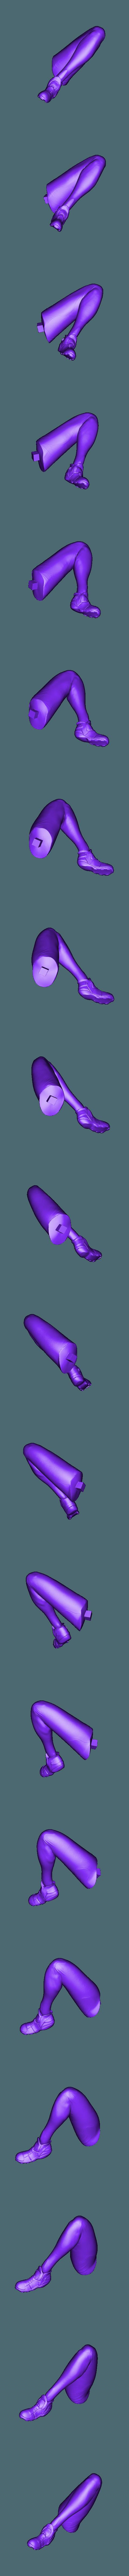 Leg_L.stl Download free STL file Ana Amari - Overwatch • 3D print template, Frazus